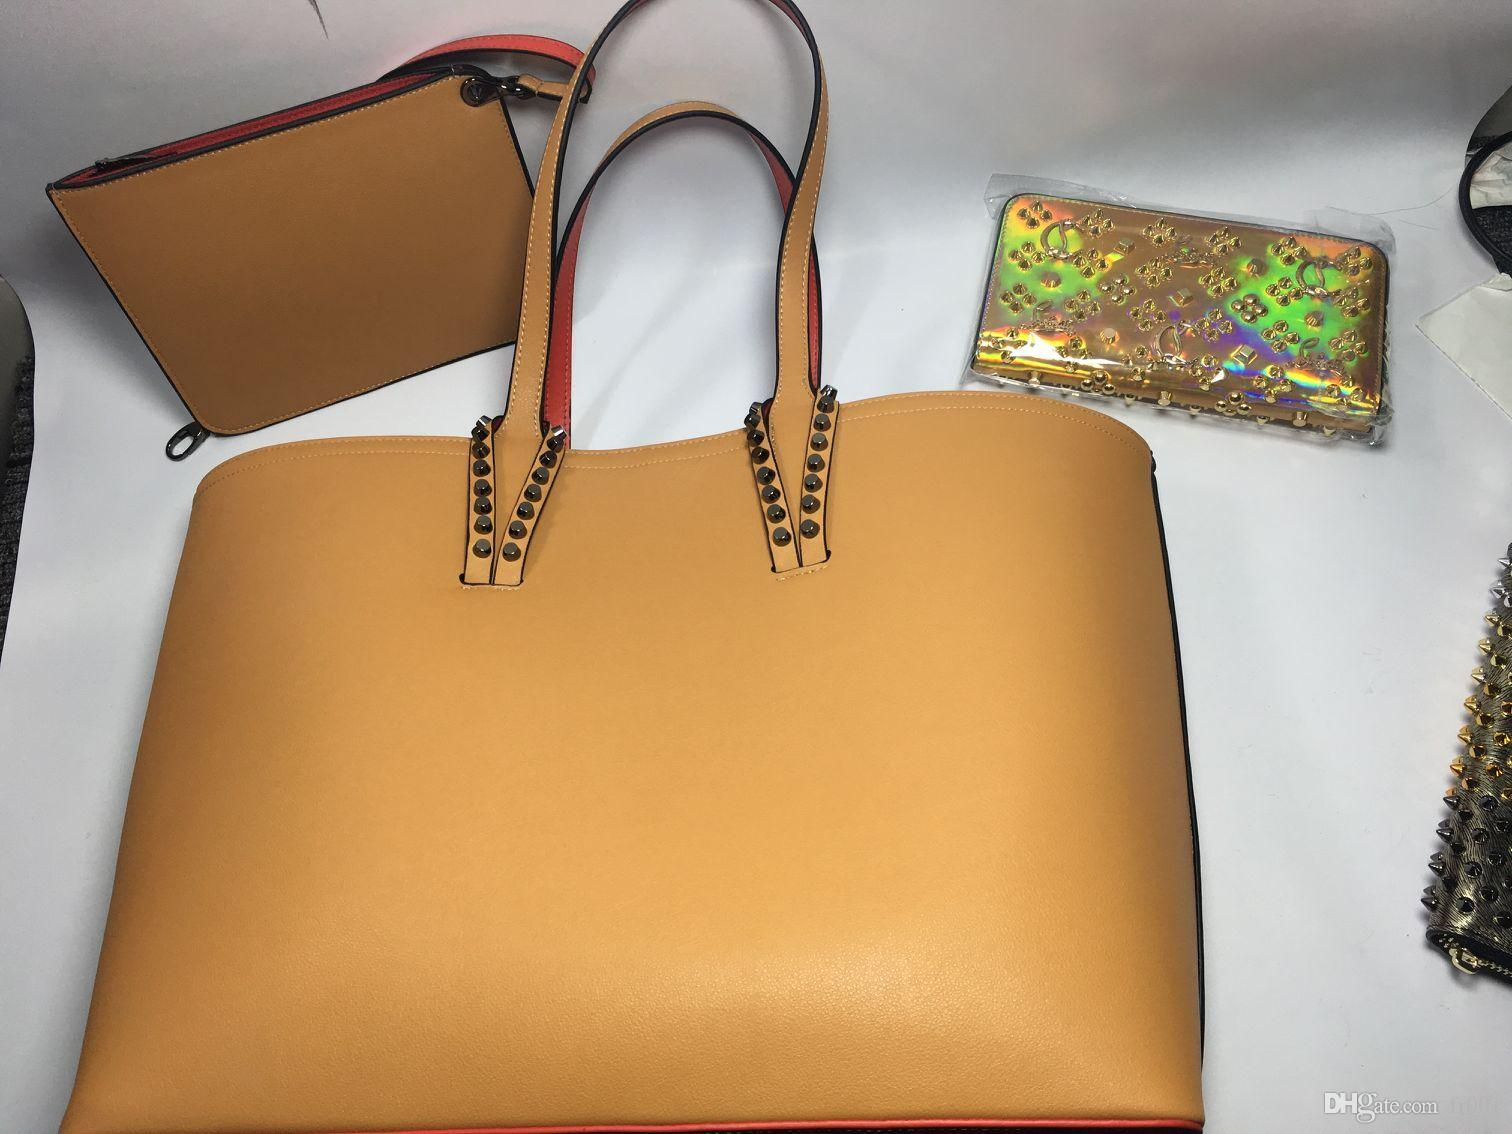 cor 2020 bolsas de grife bcabata Top totes bolsa composta famosa marca de couro genuíno deve bolsa Big bags